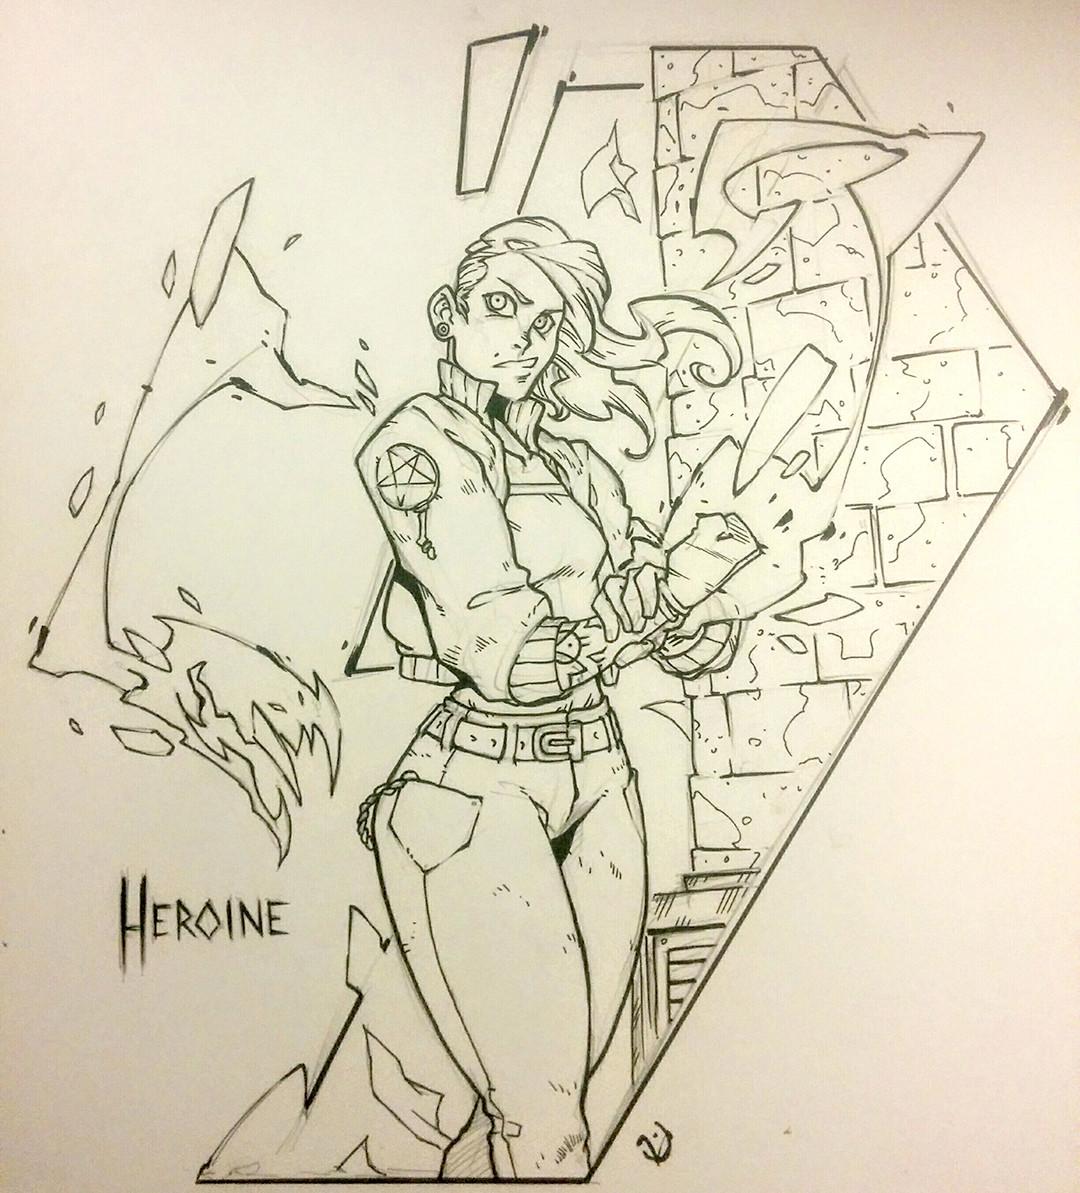 Jerome brulin 171001 heroine ld